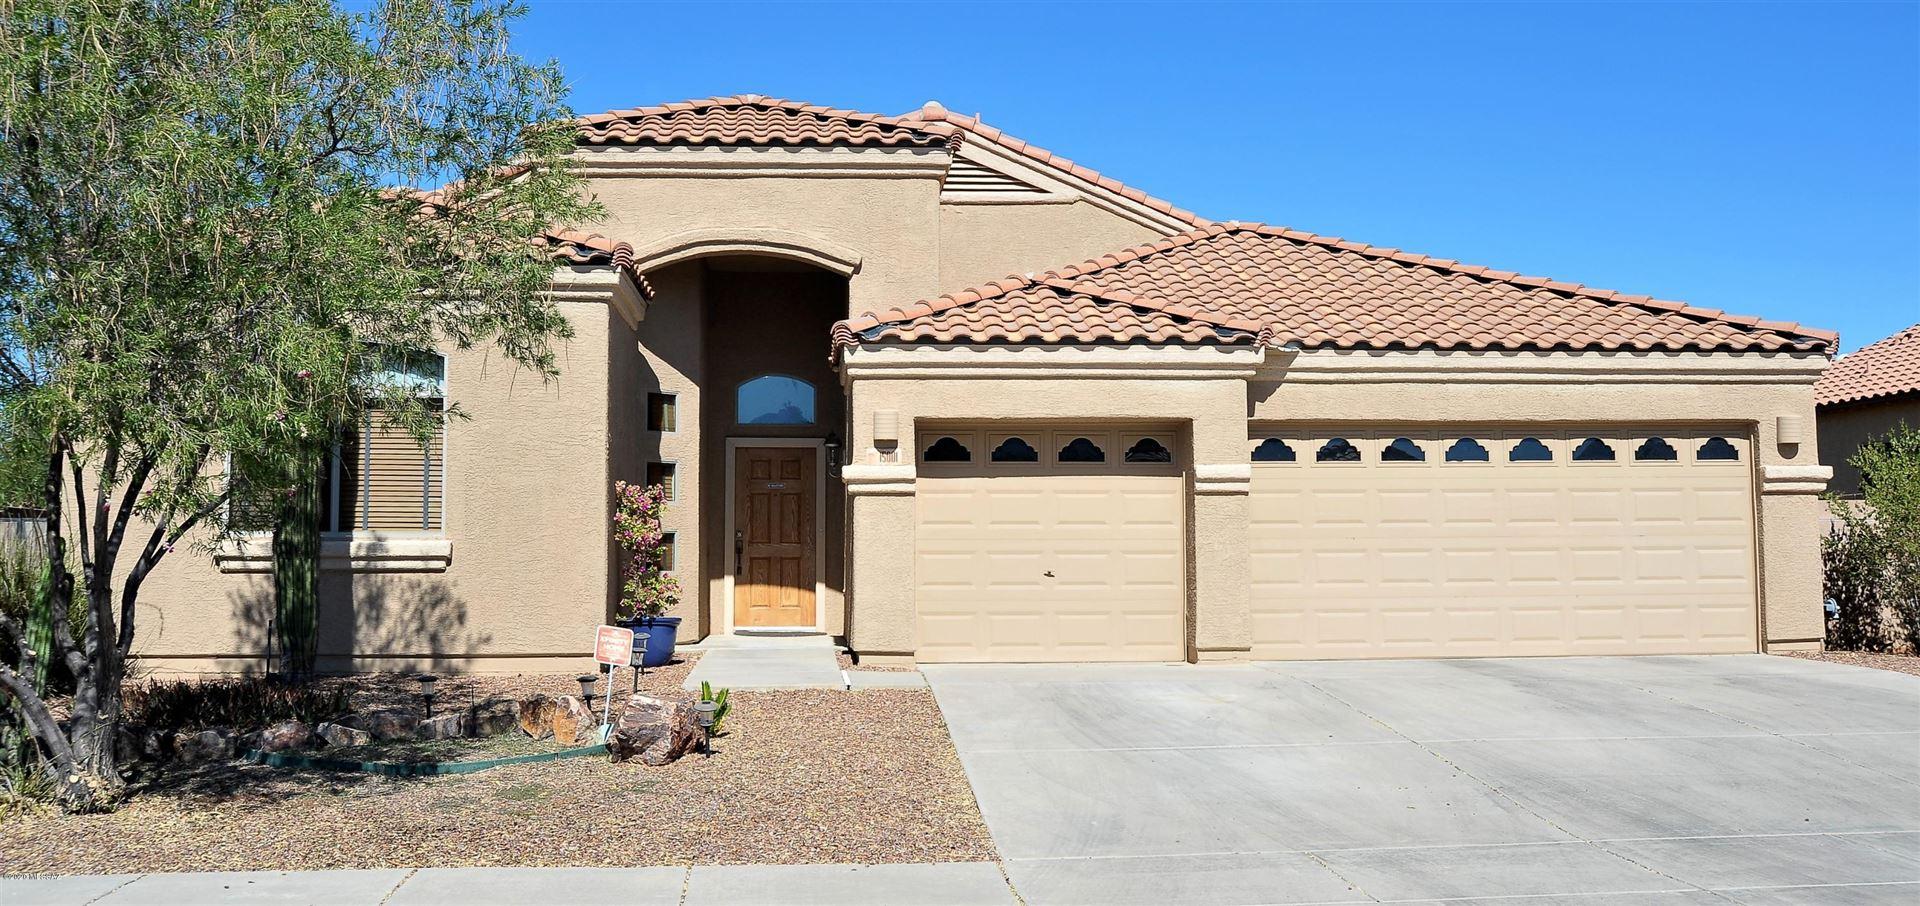 15001 N Rugged Lark Drive, Tucson, AZ 85739 - #: 22026819